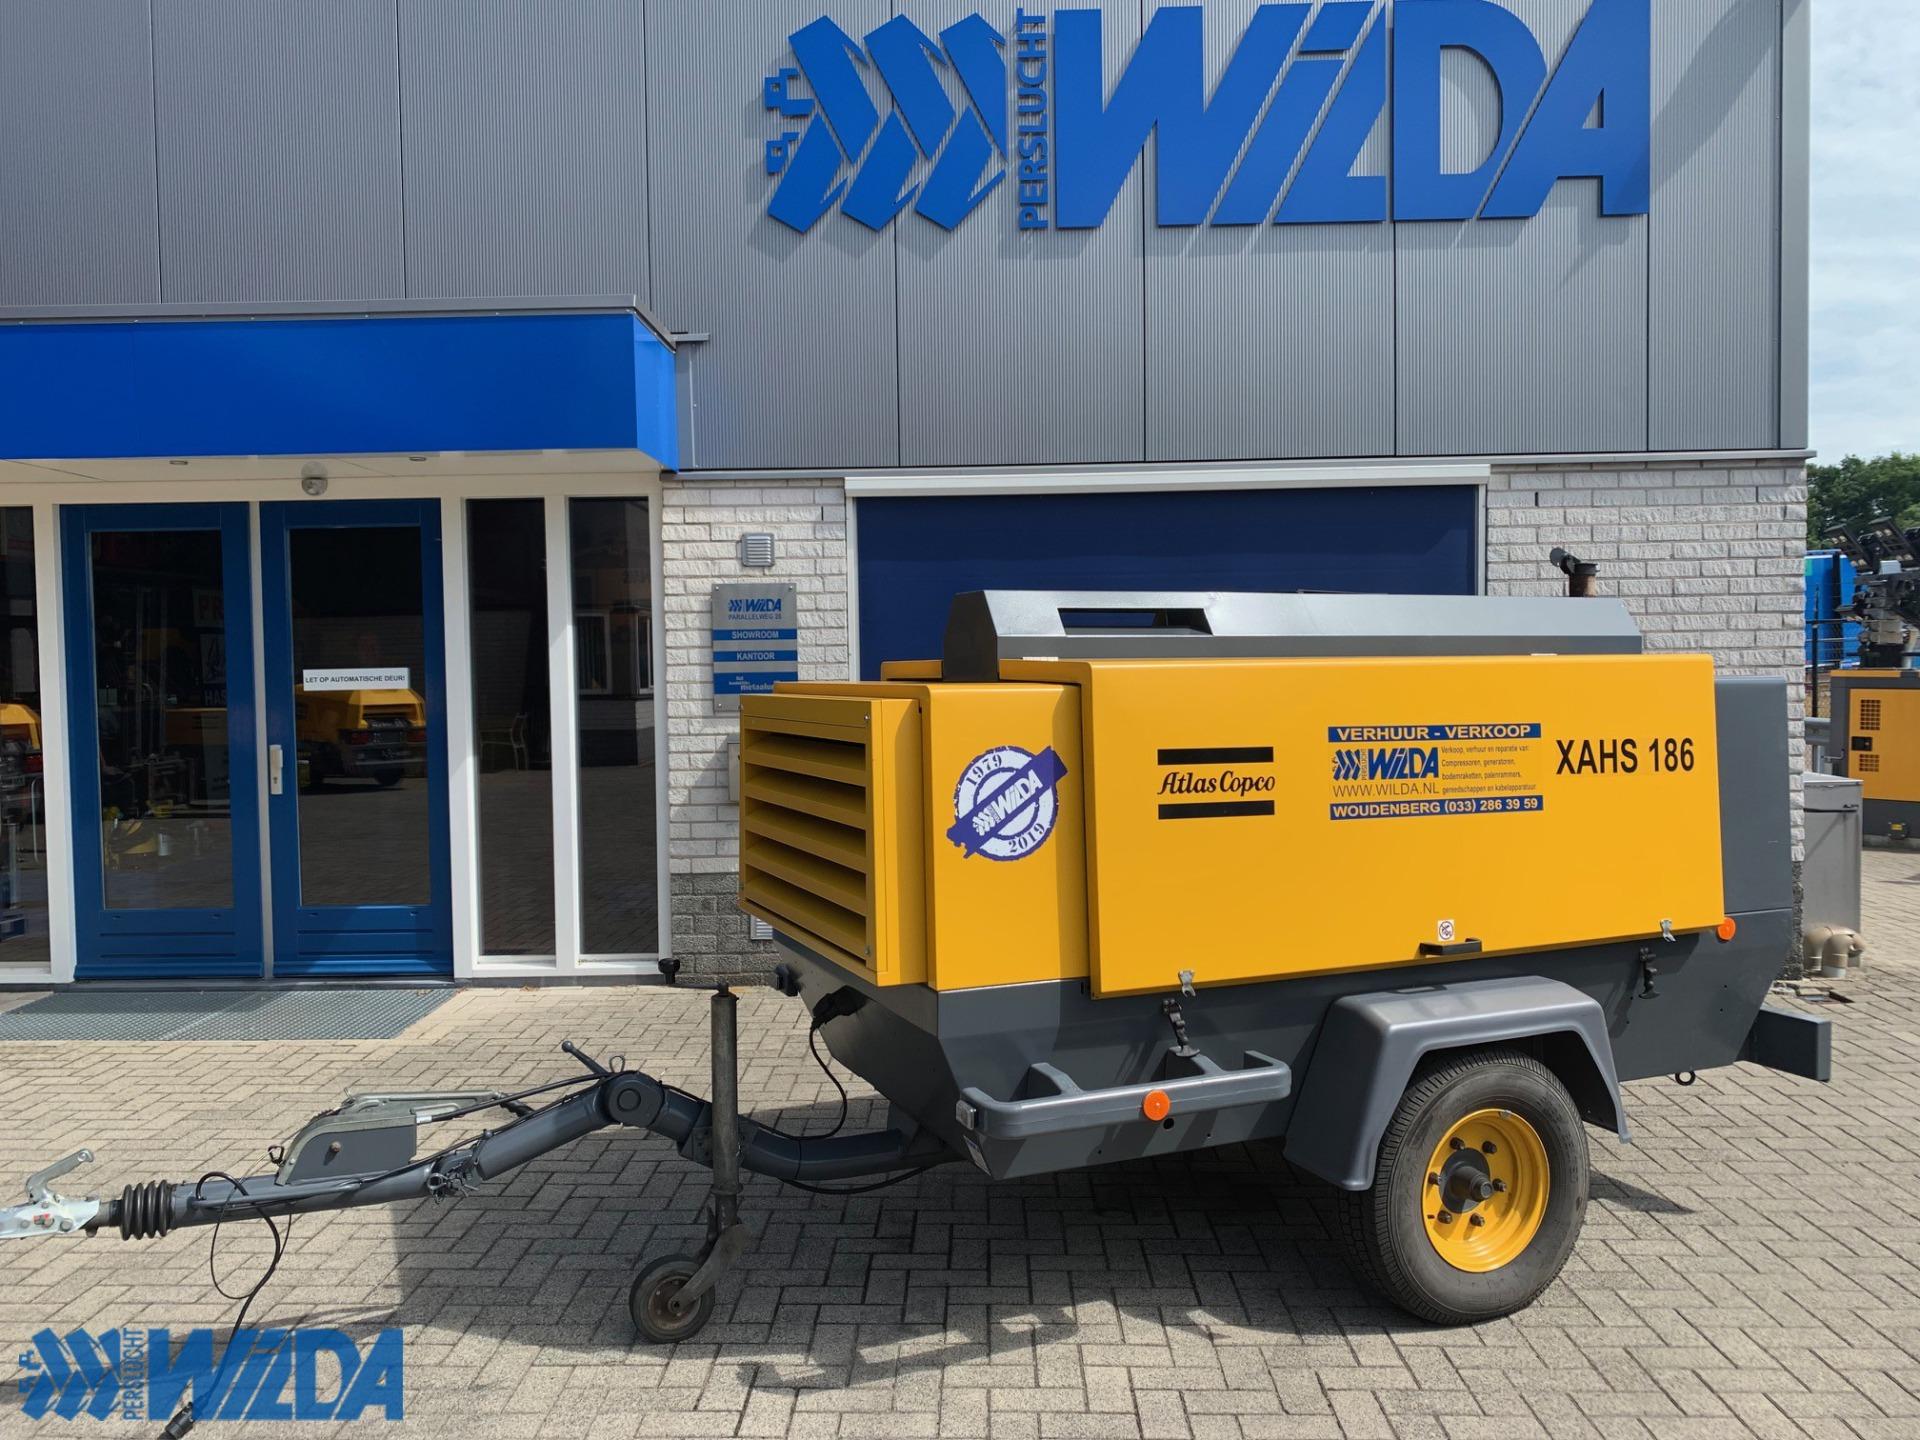 Wilda-gebruikte-mobiele-generator-Atlas-Copco-XAHS-186-Dd